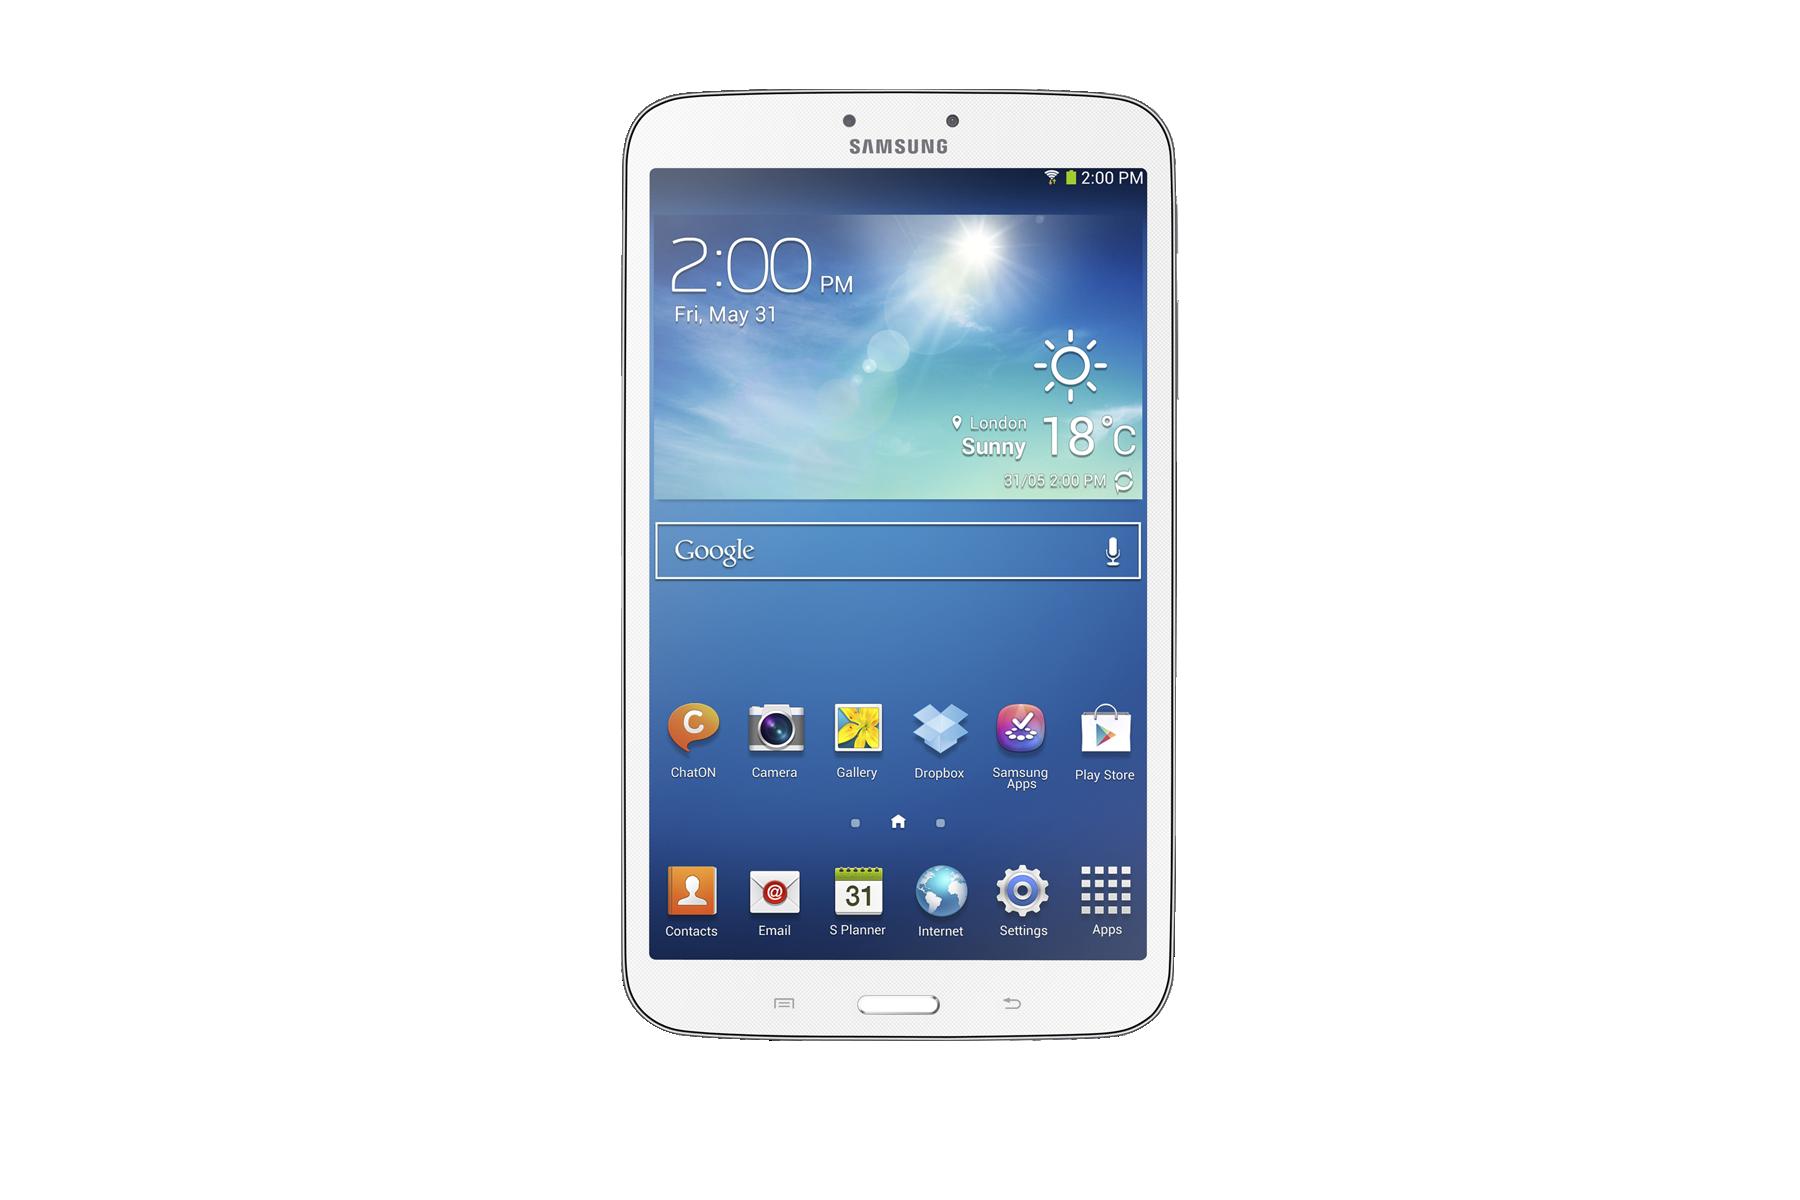 TAB 3 8.0 /& TAB 3 10. USB Charger and Cable Lead Samsung Galaxy Tab 3 7.0